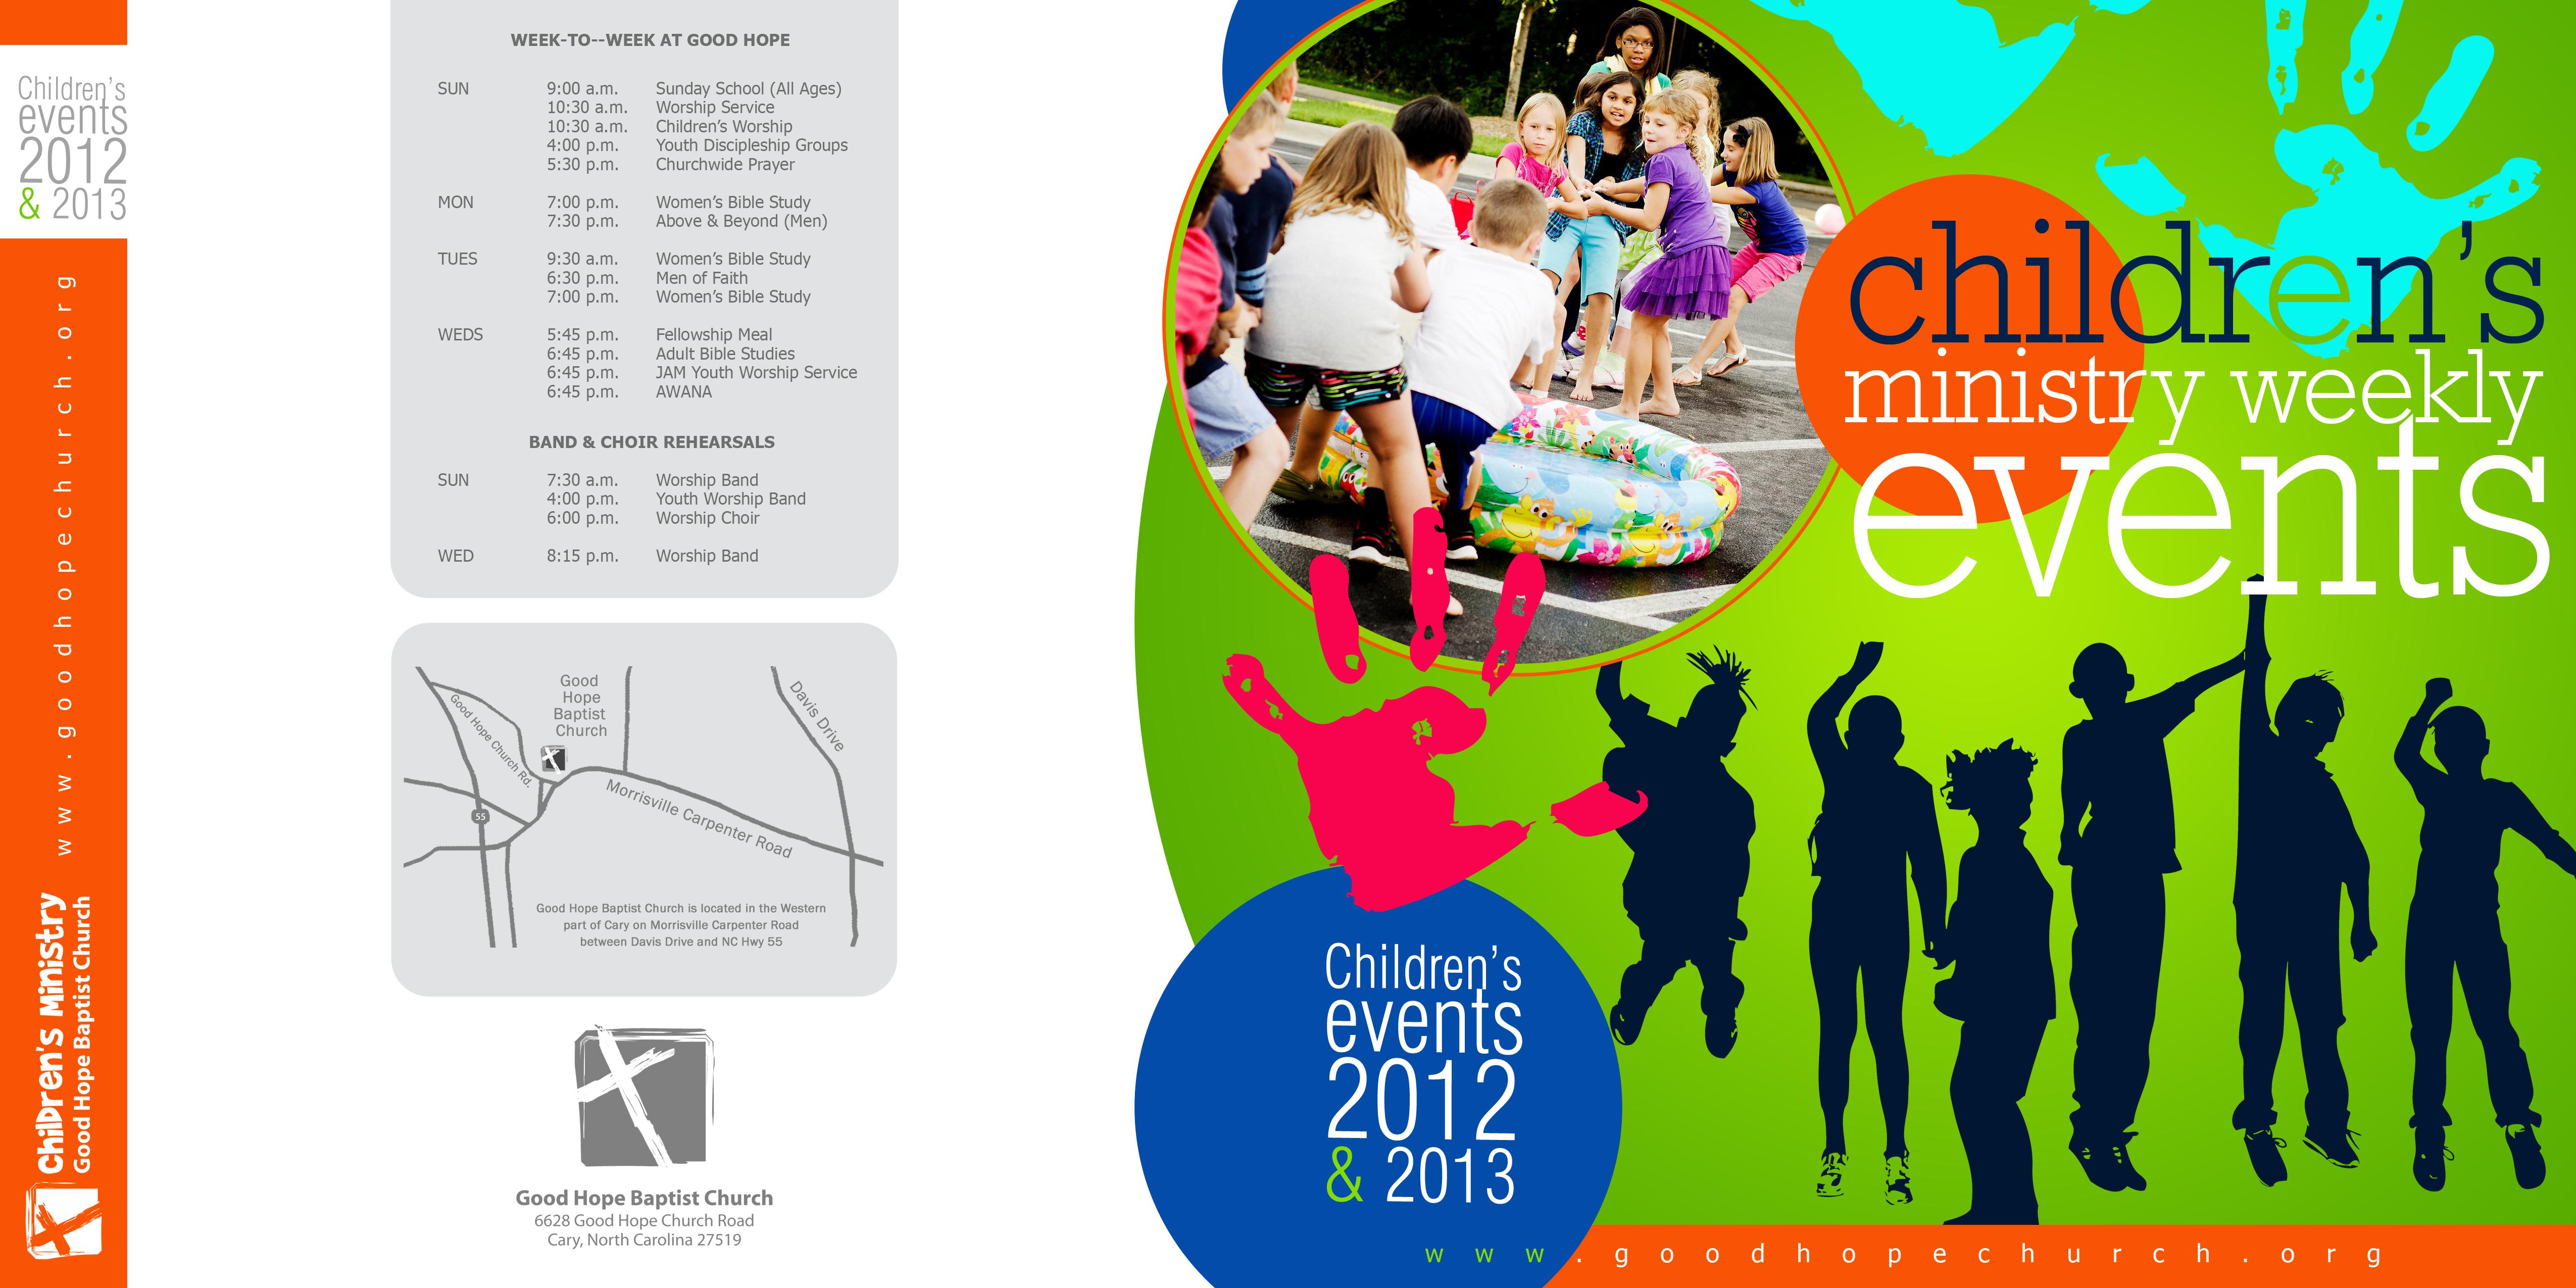 ghbc_childrens_program-2012-2013_front_proof